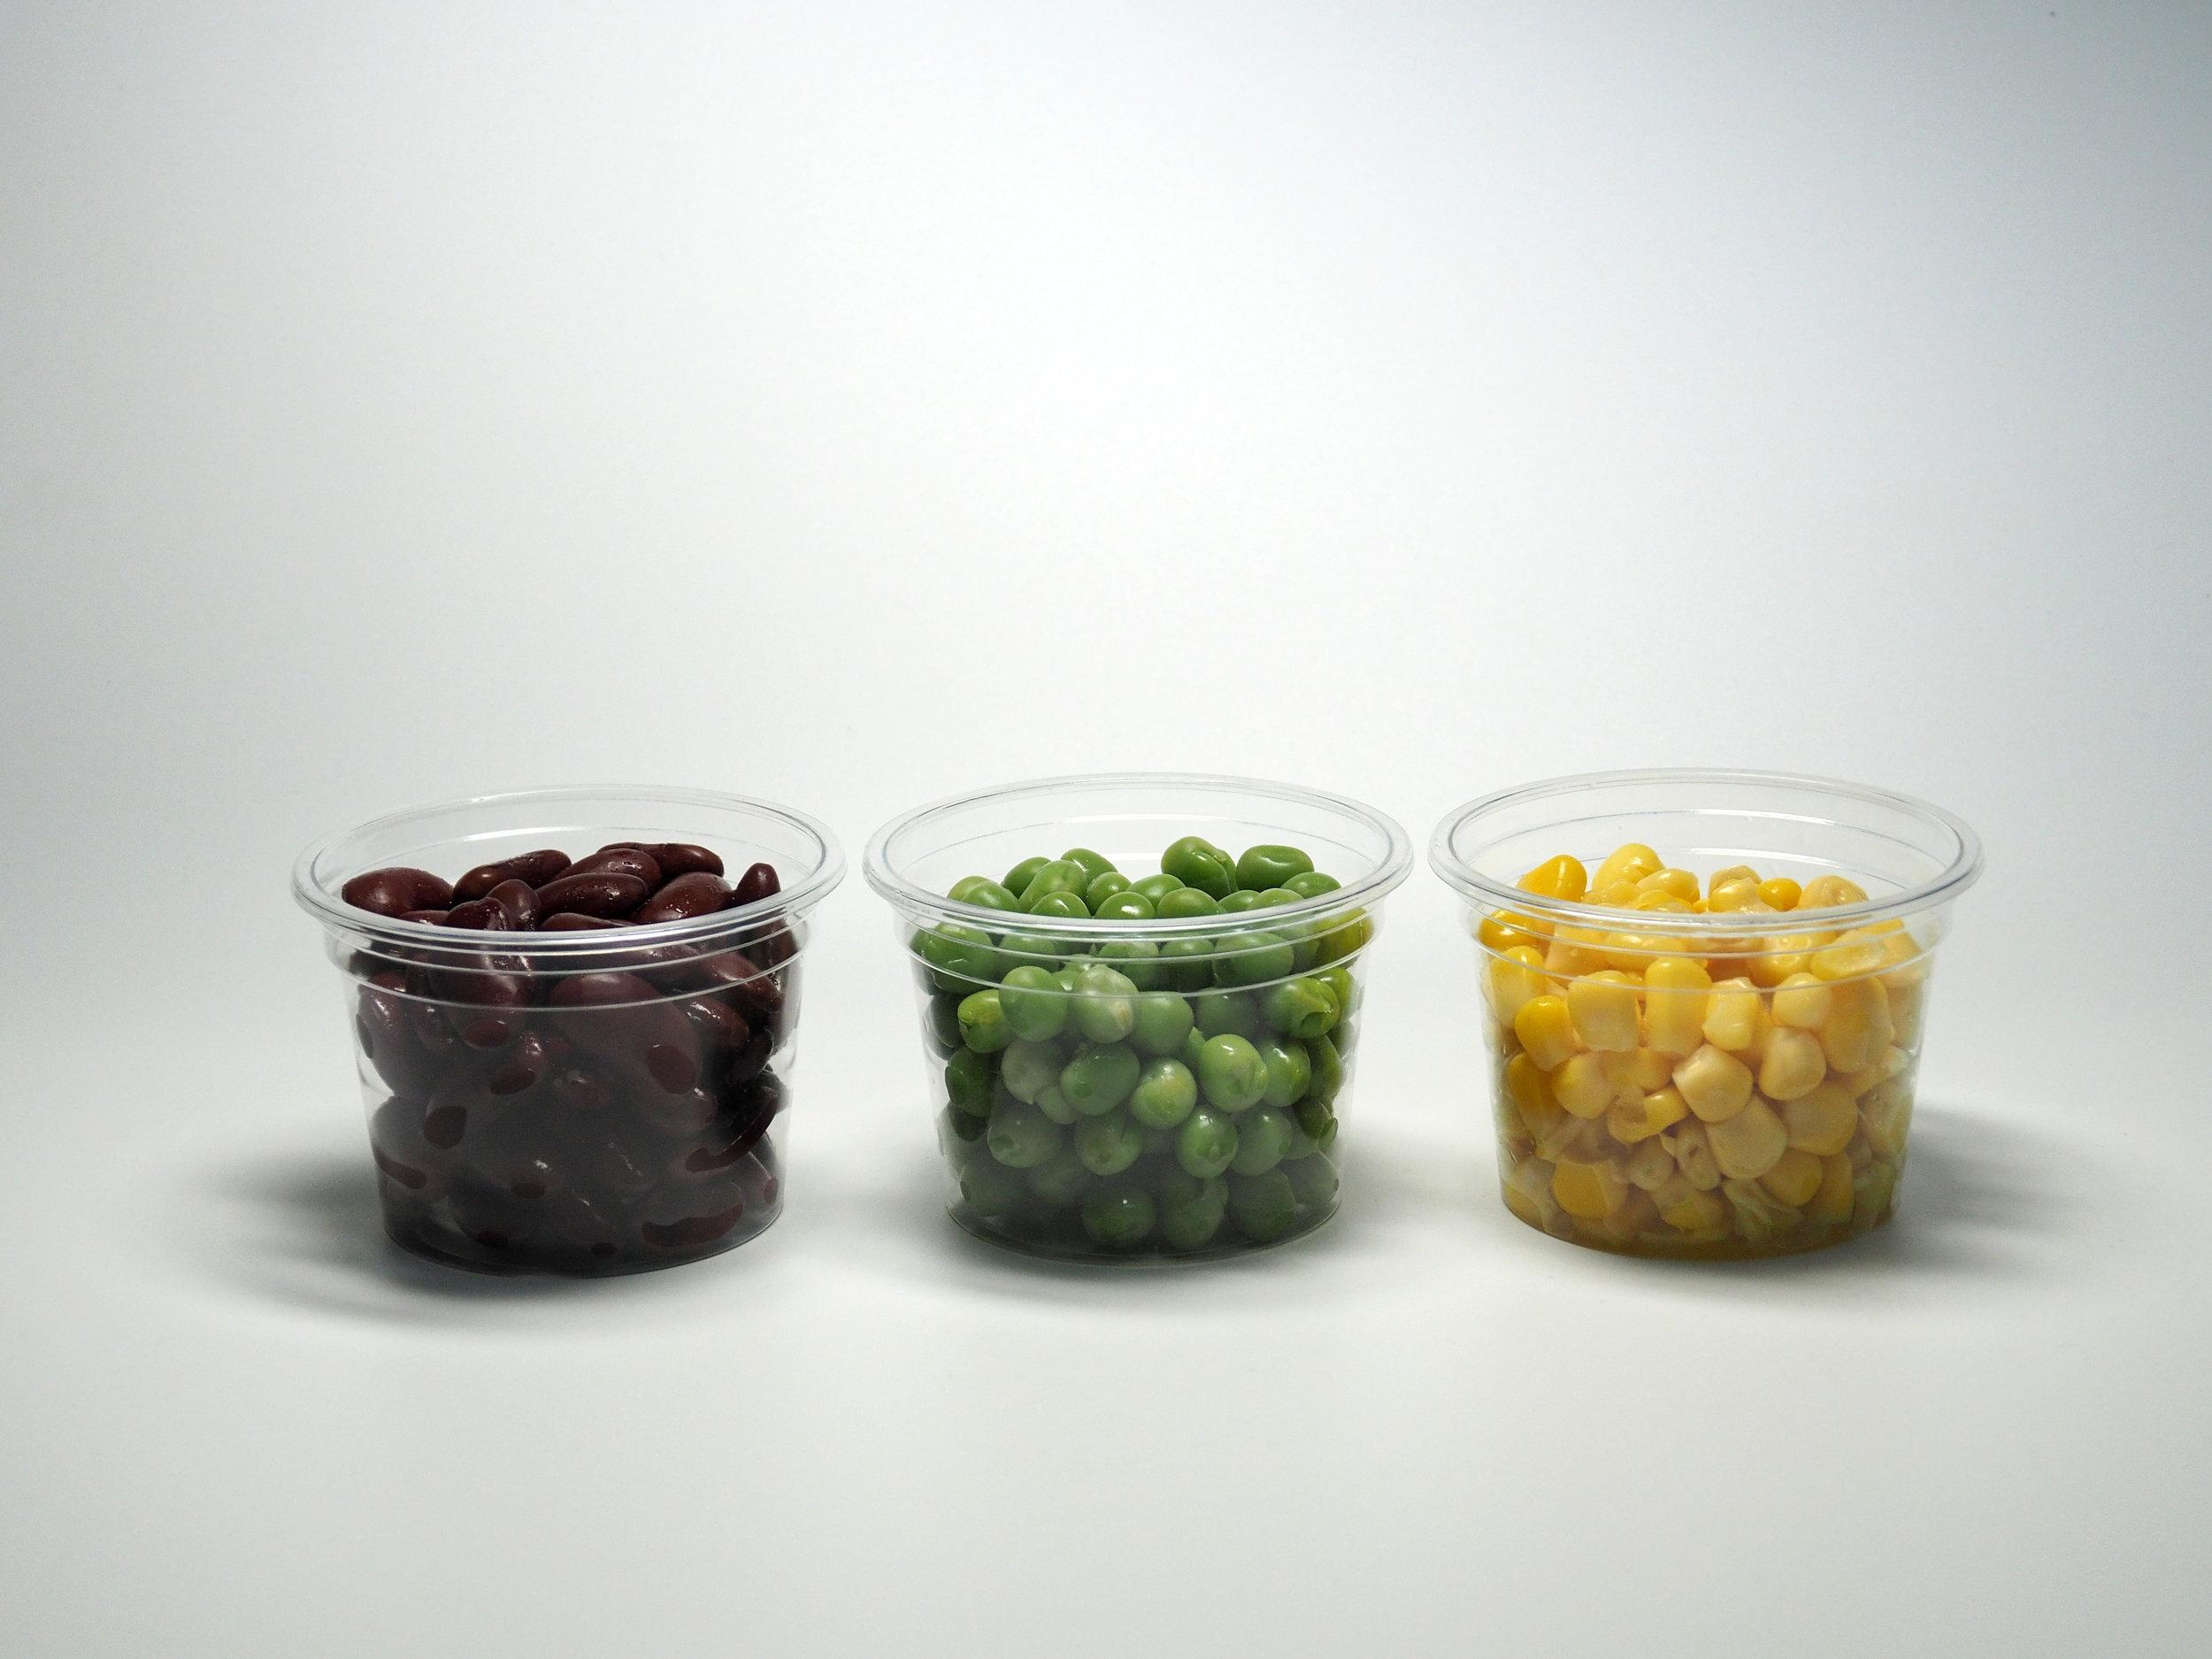 Canva - Whole Grains, Nuts, Corn, Red Bean, Peas, Plastic.jpg